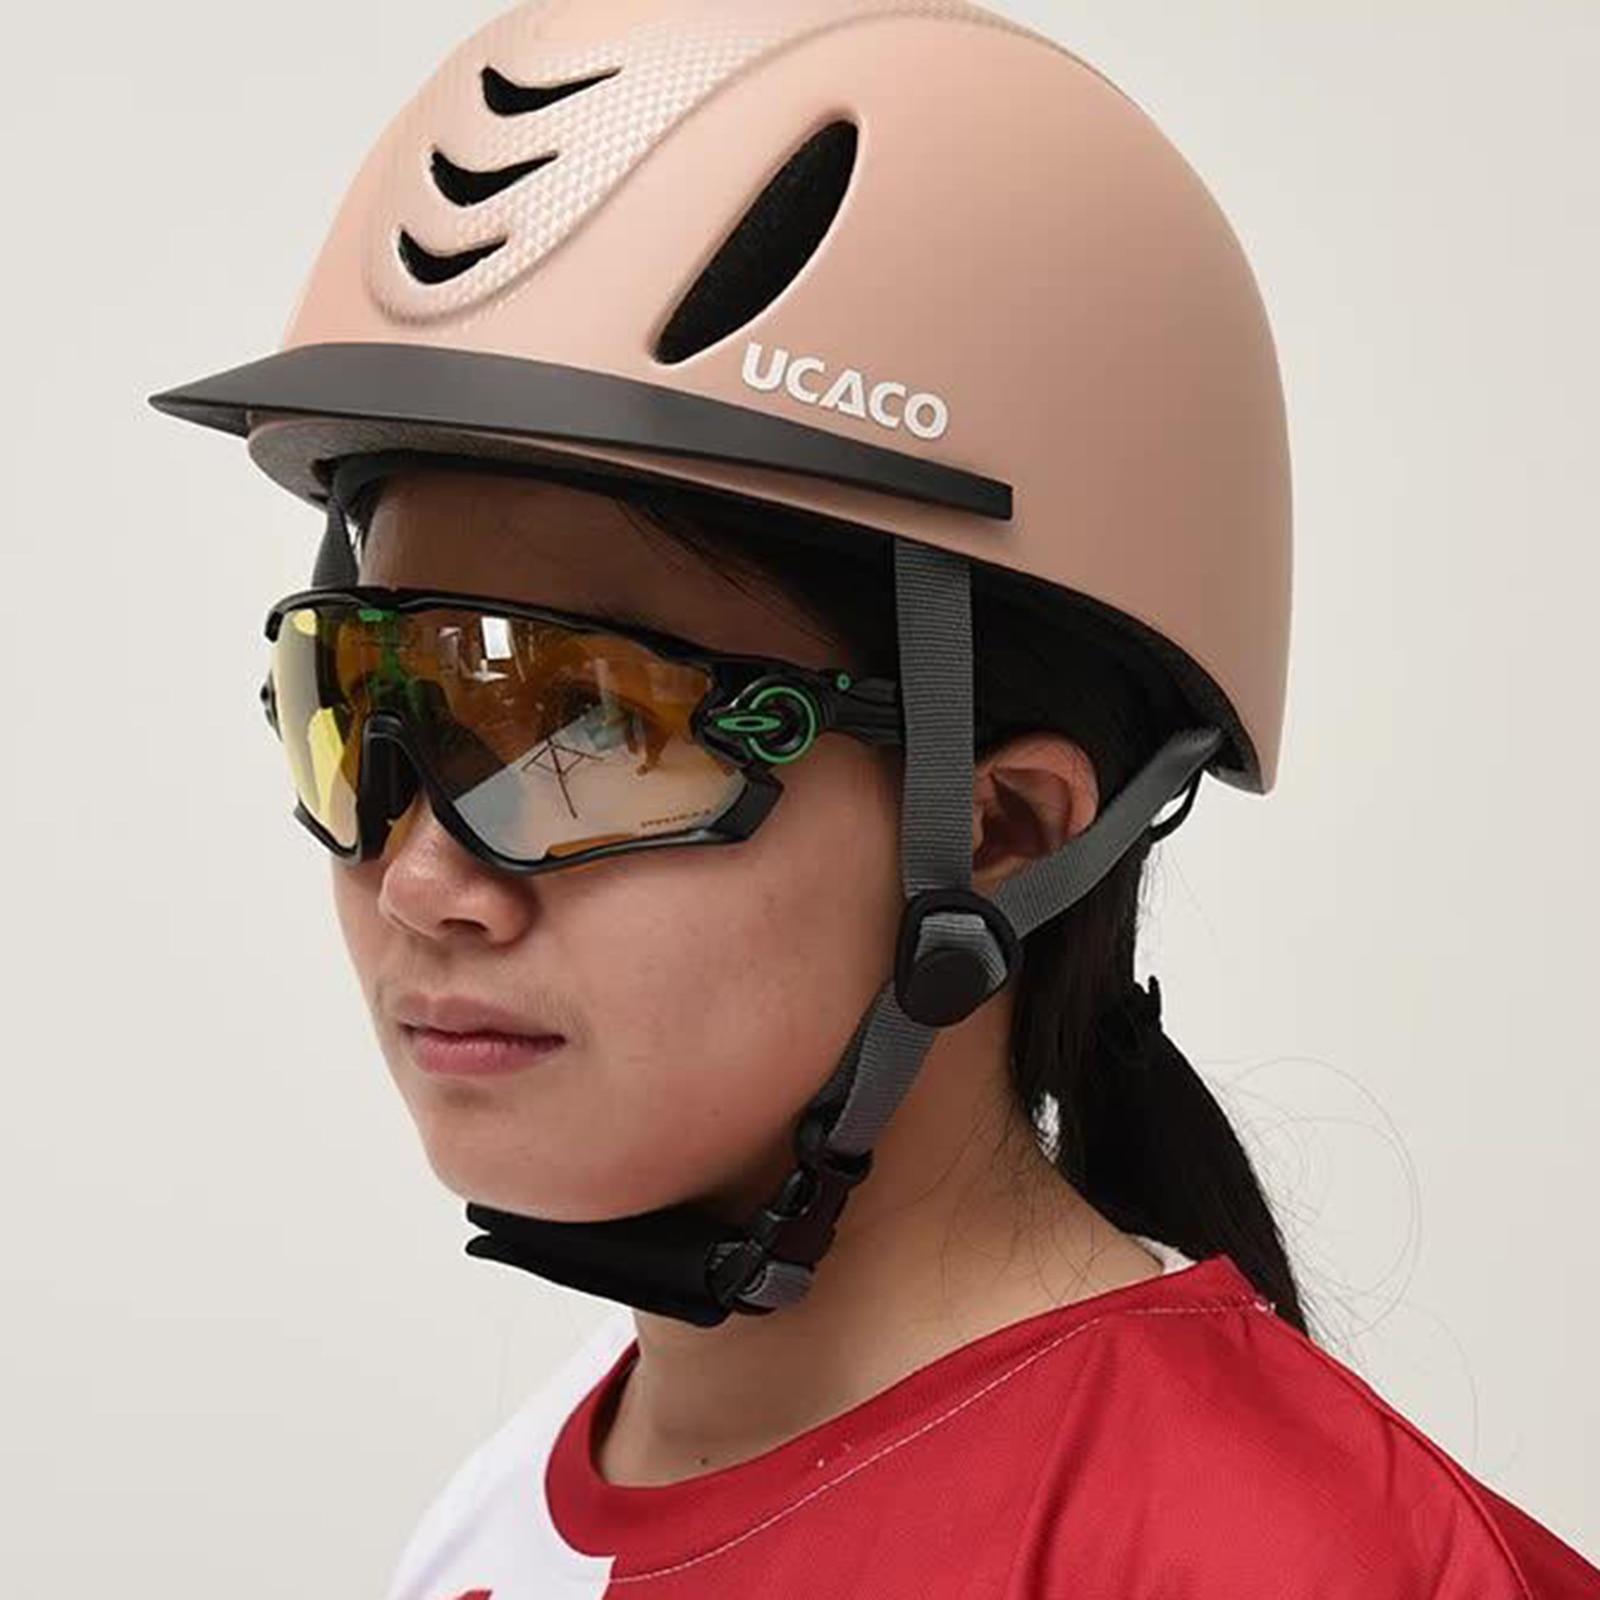 Starter Equestrian Helmet Safety Helmet for over 13 years Old CE Certified